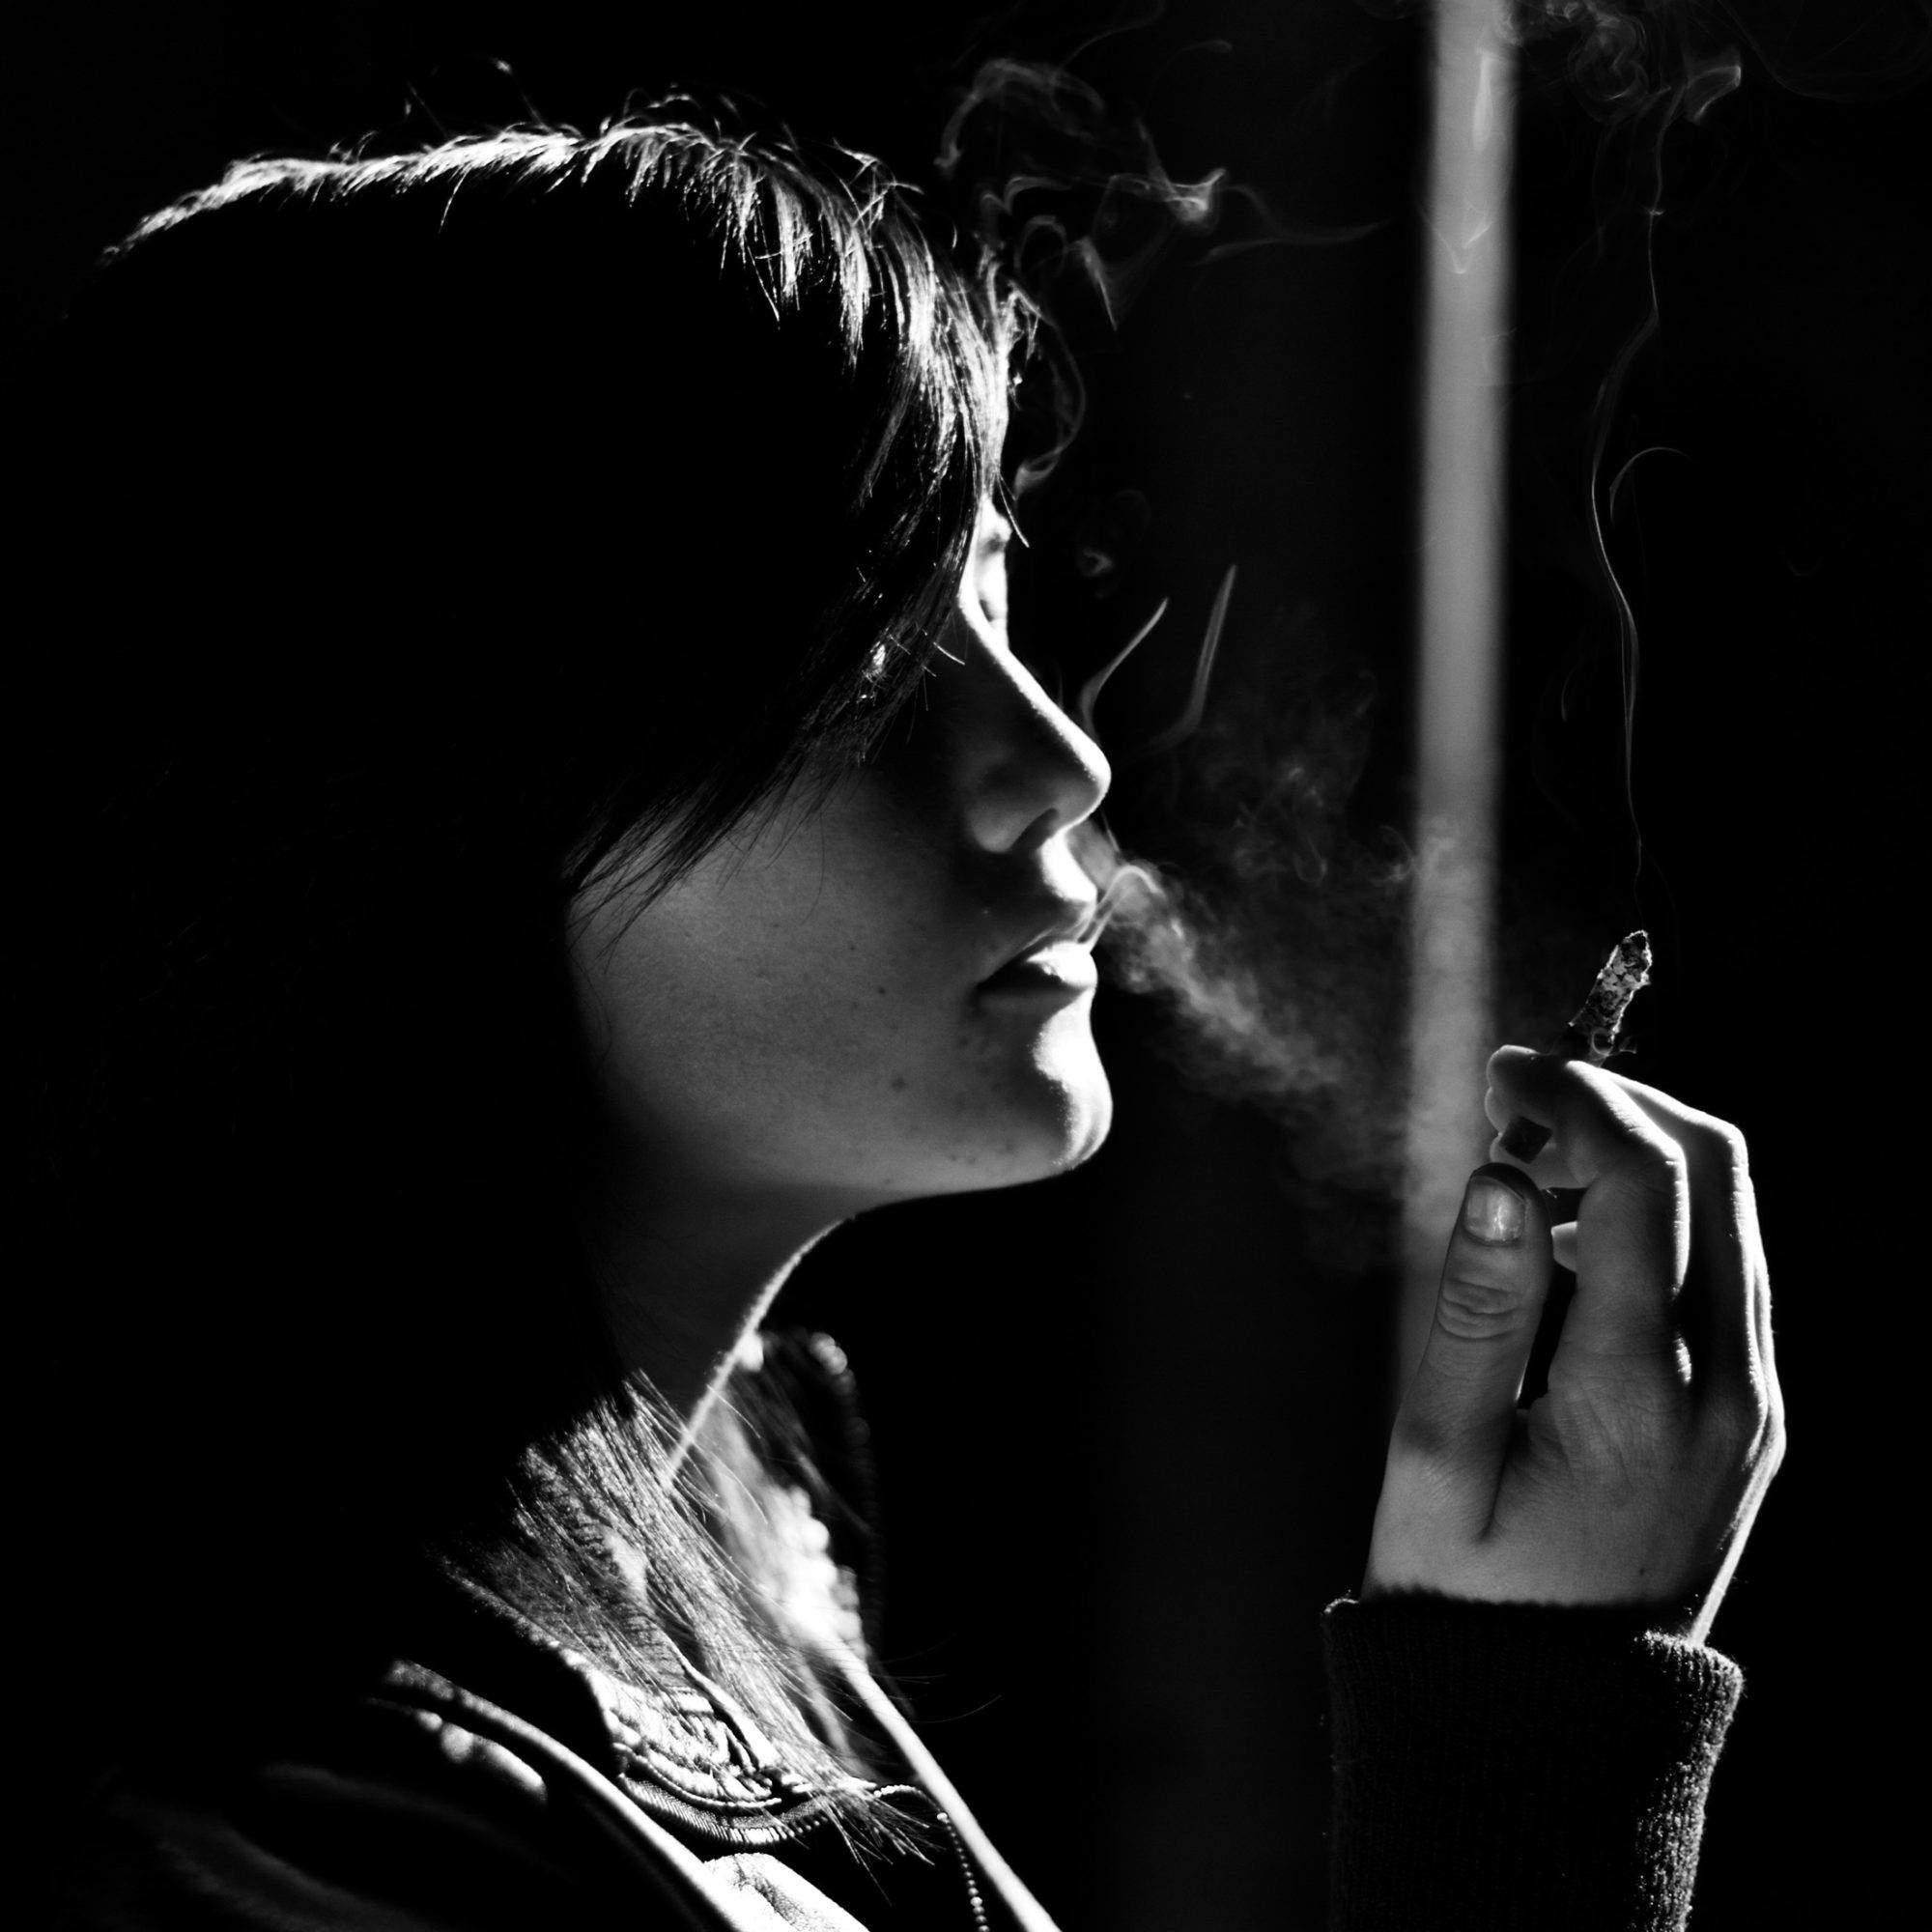 MASSIMILIANO SCARPA photographer portrait - Elisa Siciliotti 2012